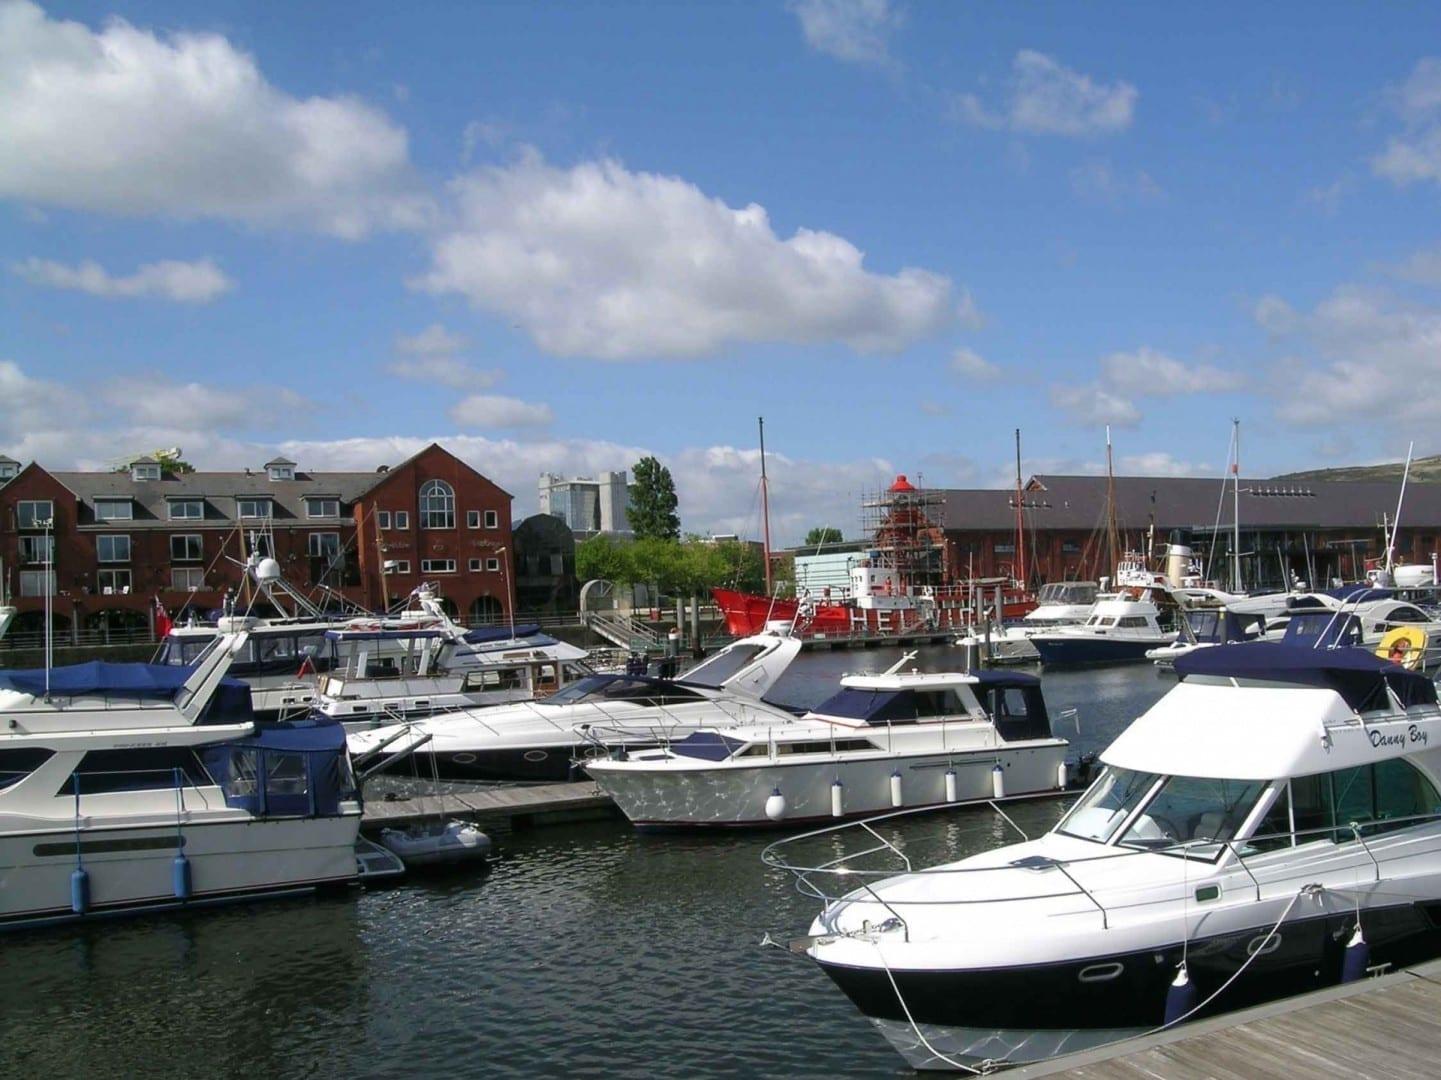 Swansea Marina Swansea Reino Unido